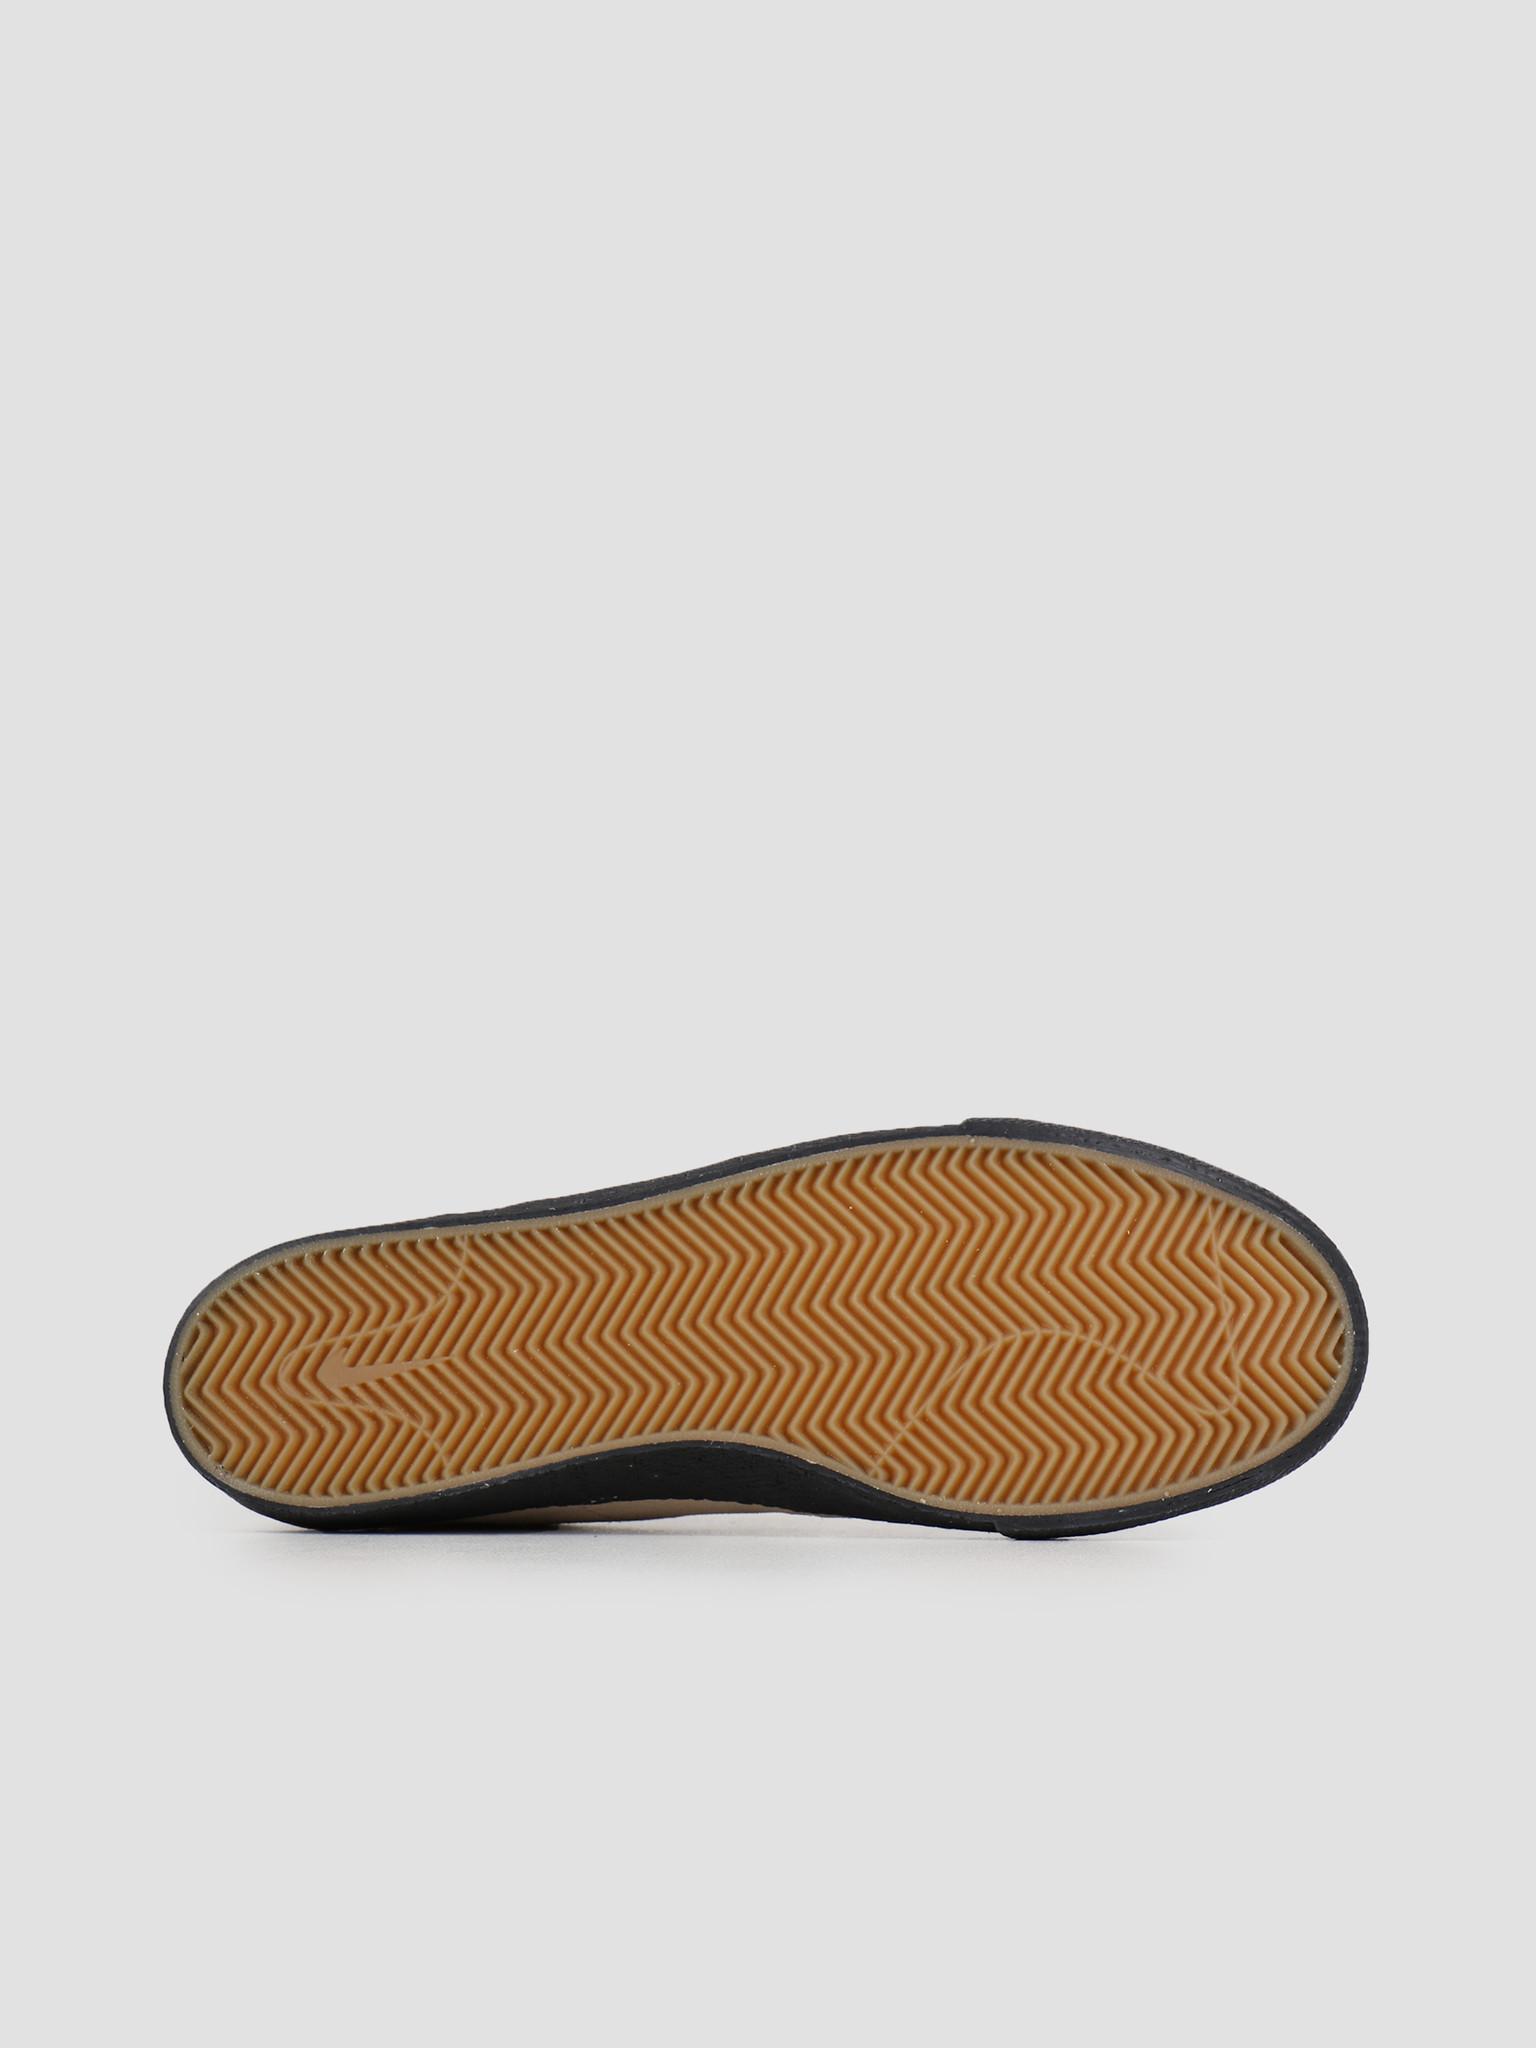 Nike Nike SB Zoom Bruin Desert Ore Black AQ7941-201